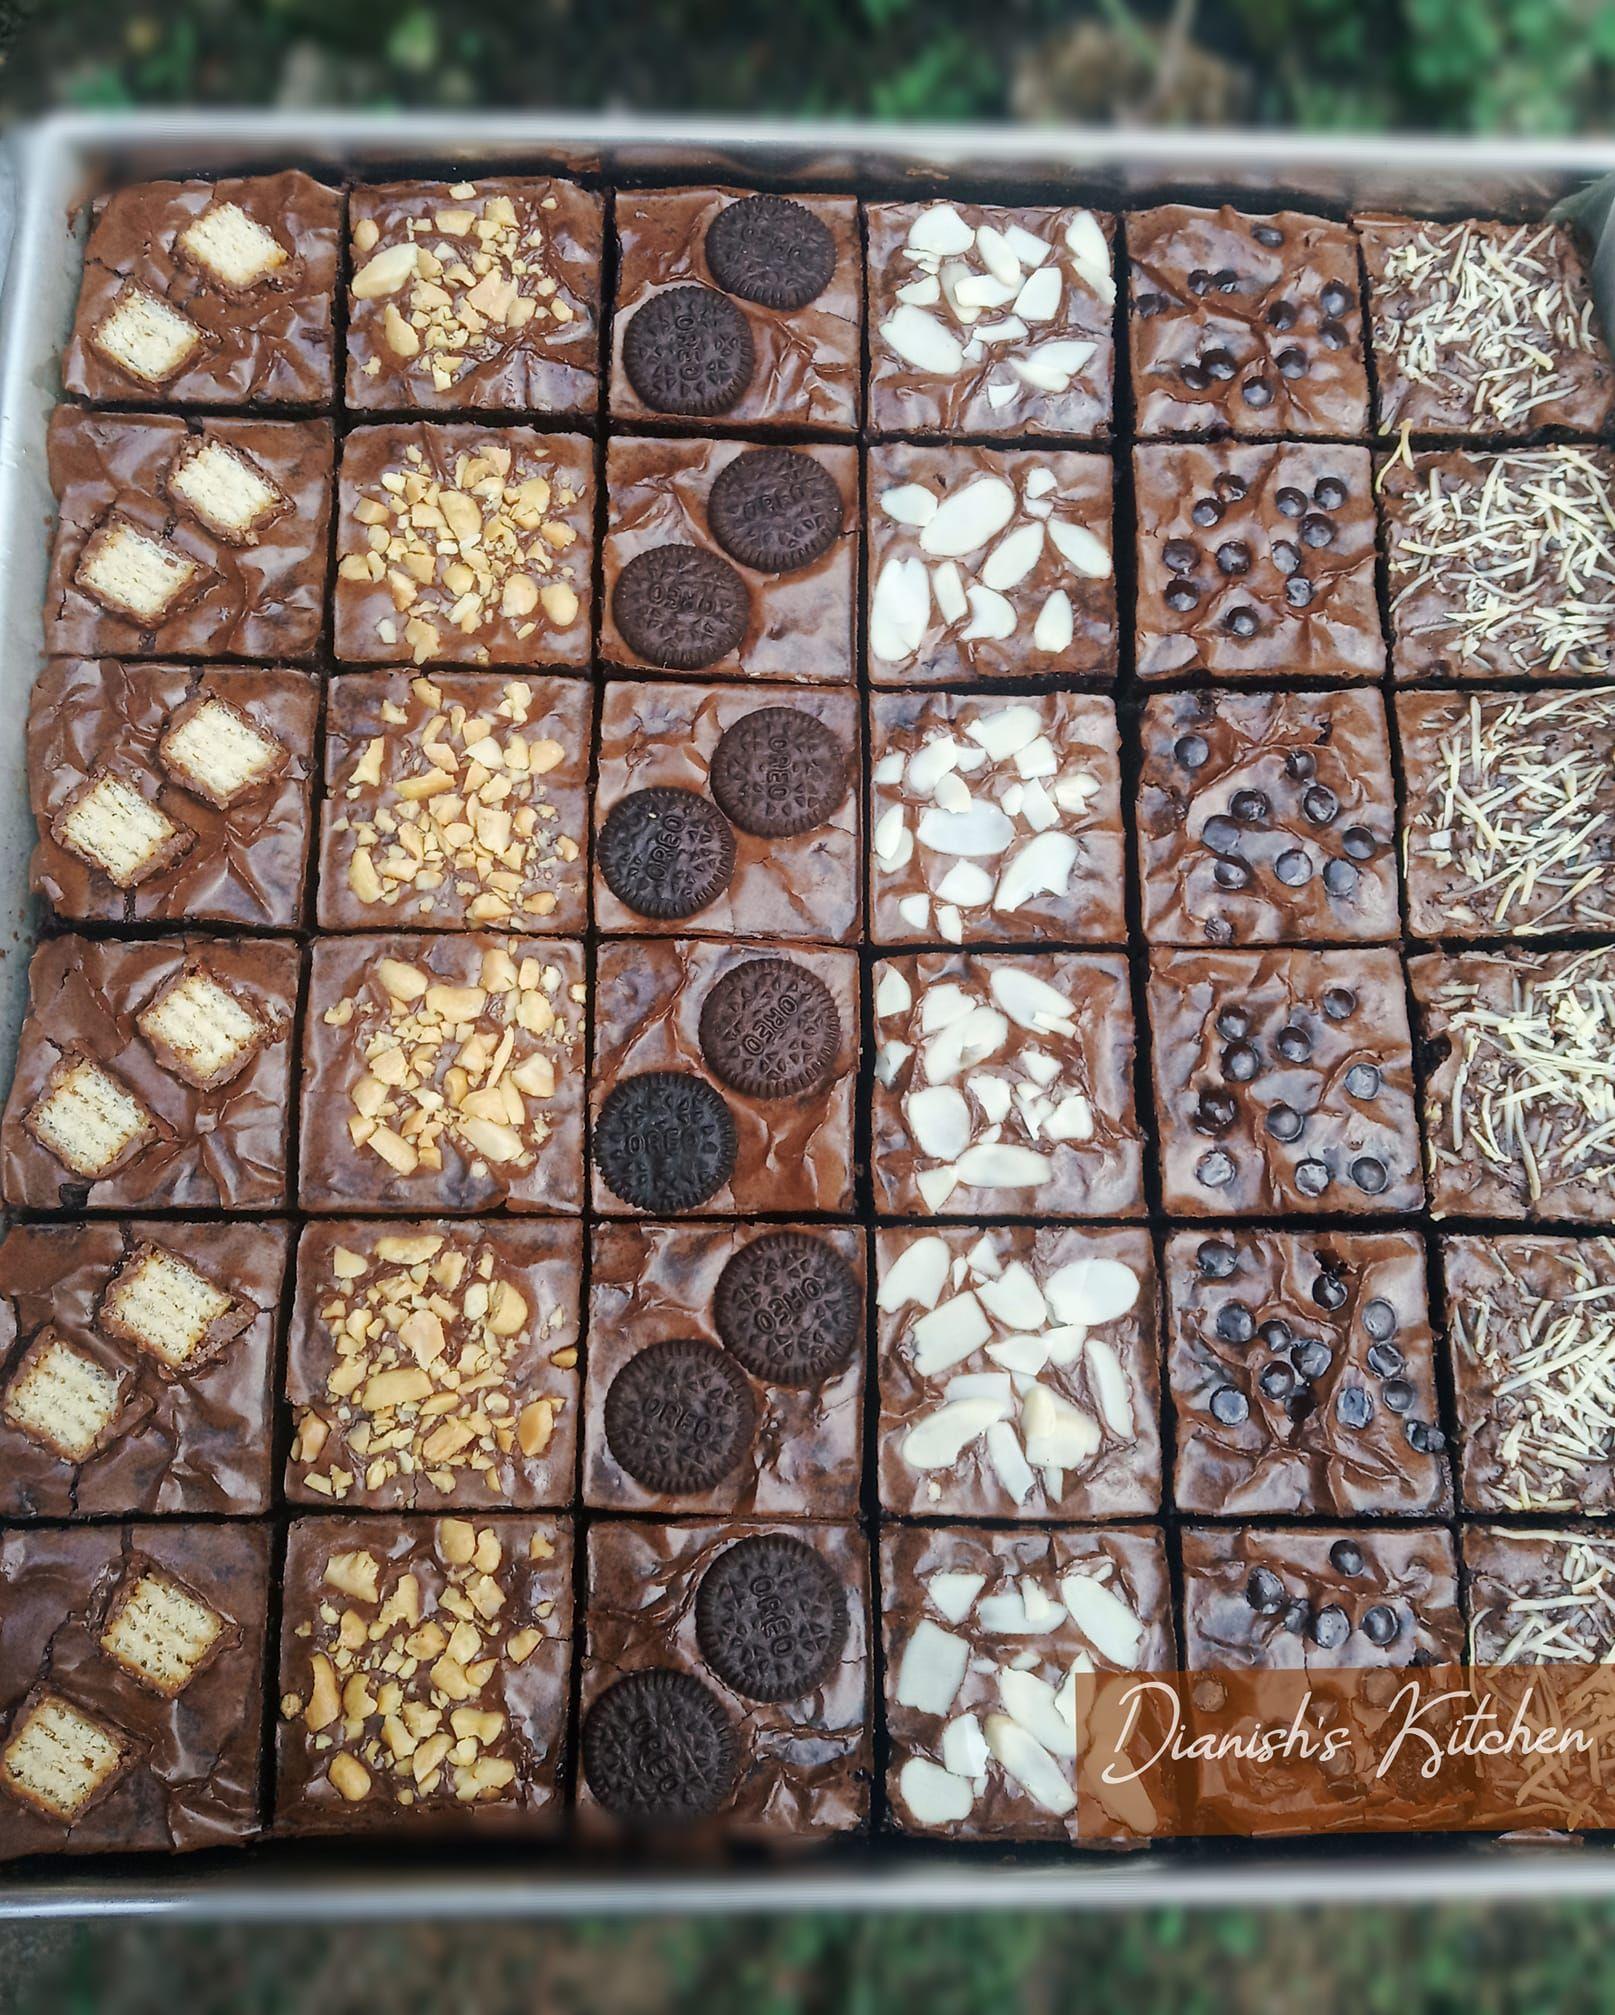 Resep Fudgy Brownies Ukuran Jumbo By Dianish S Kitchen Fudgy Brownies Brownies Adonan